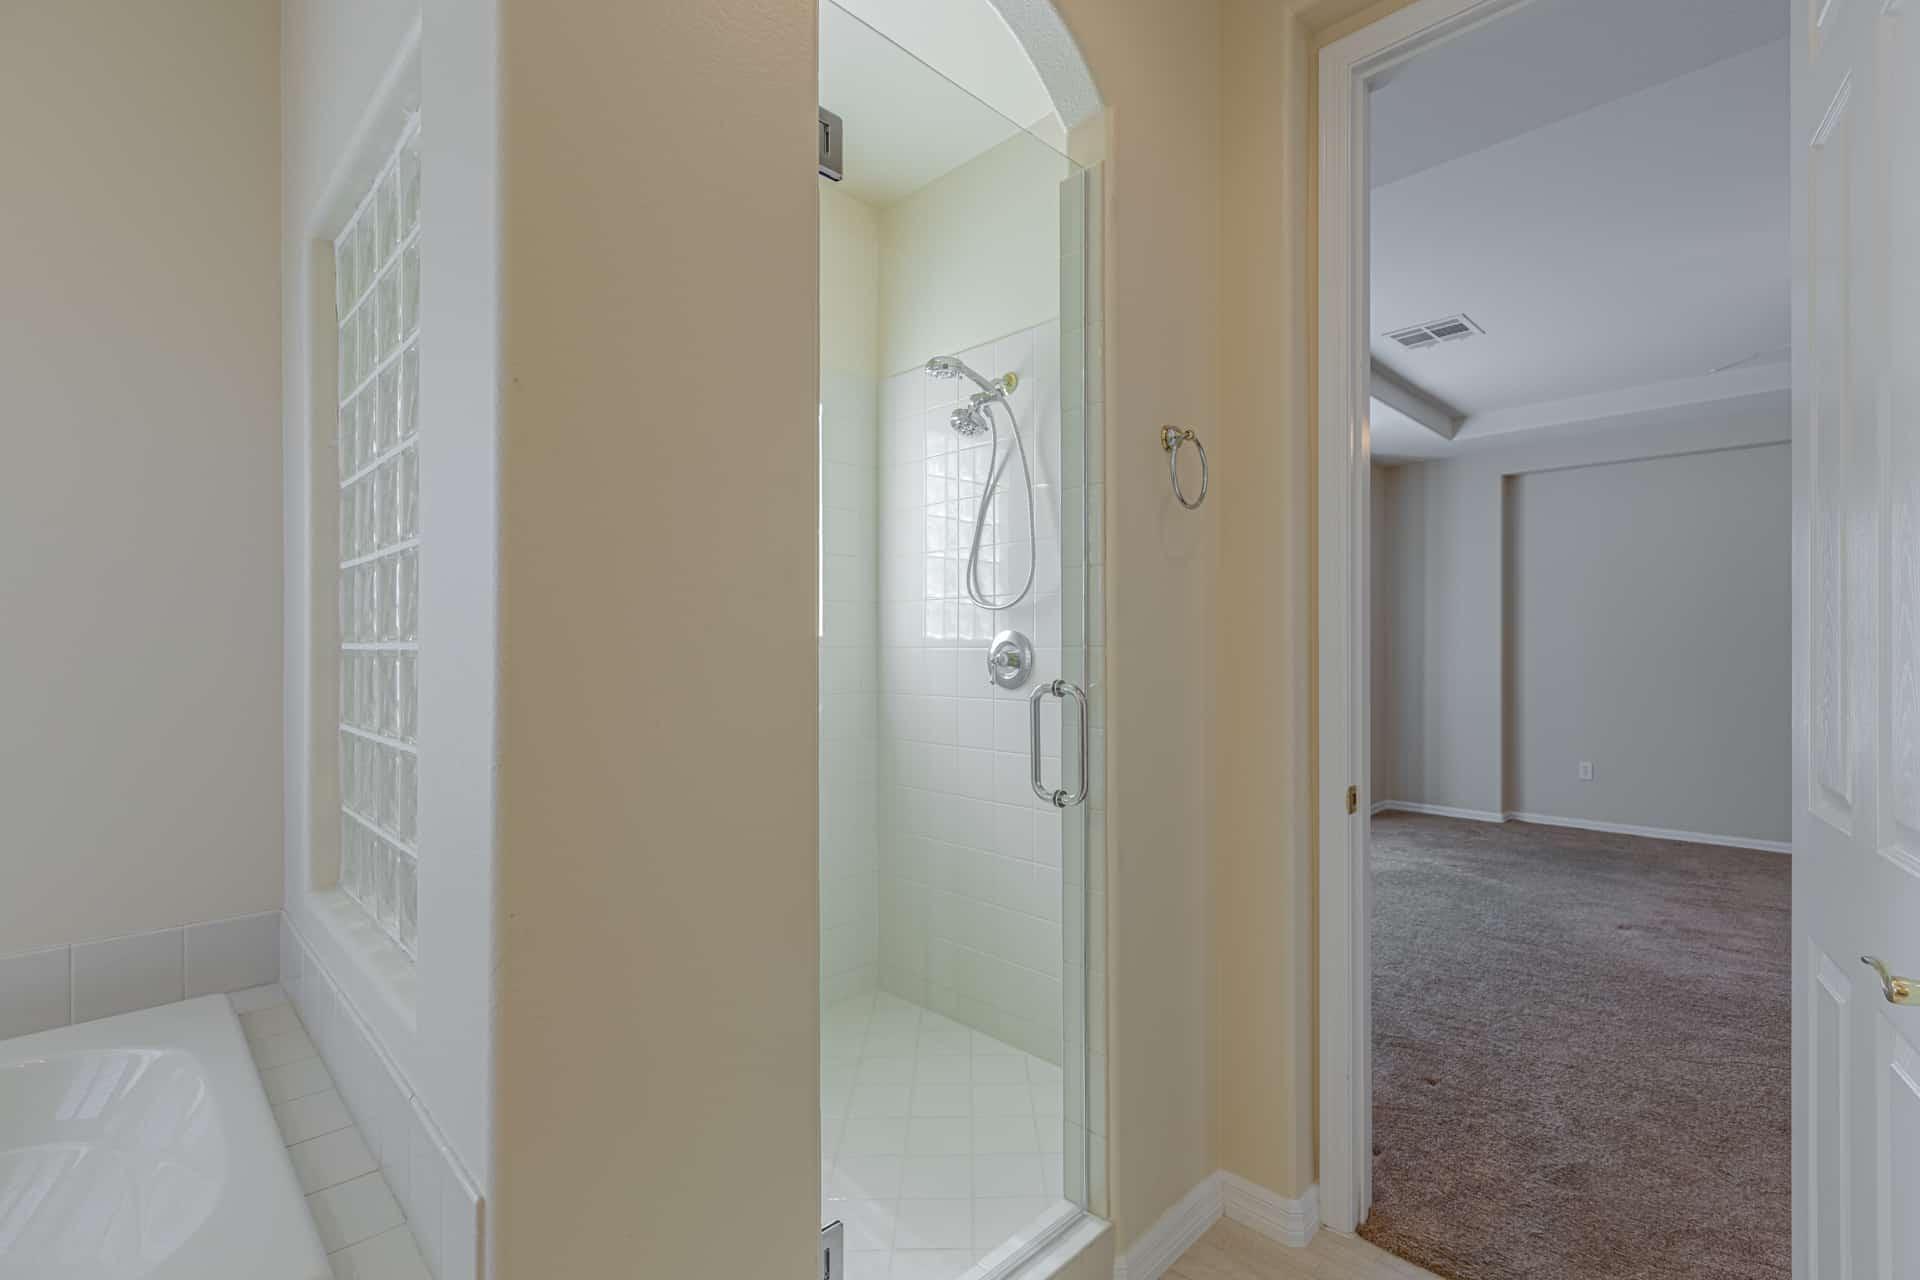 las-vegas-luxry-real-estate-realtor-rob-jensen-company-10729-grey-havens-court-willow-creek3657